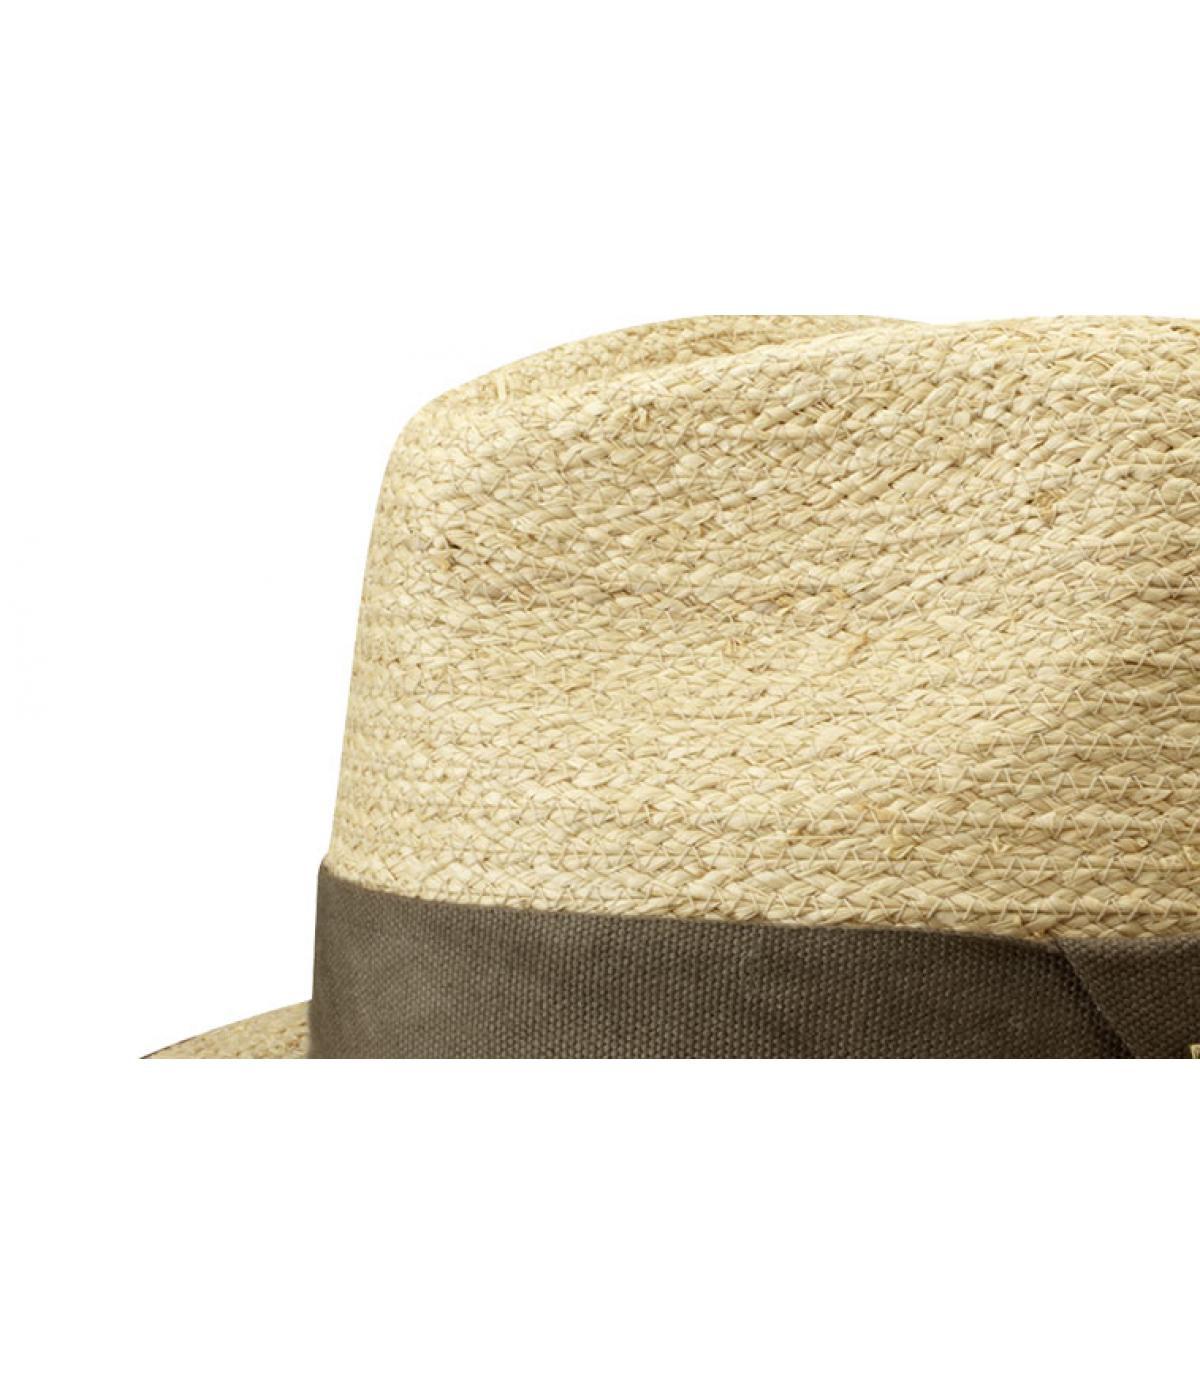 Merriam panama hat - Merriam raffia by Stetson. 29525152275